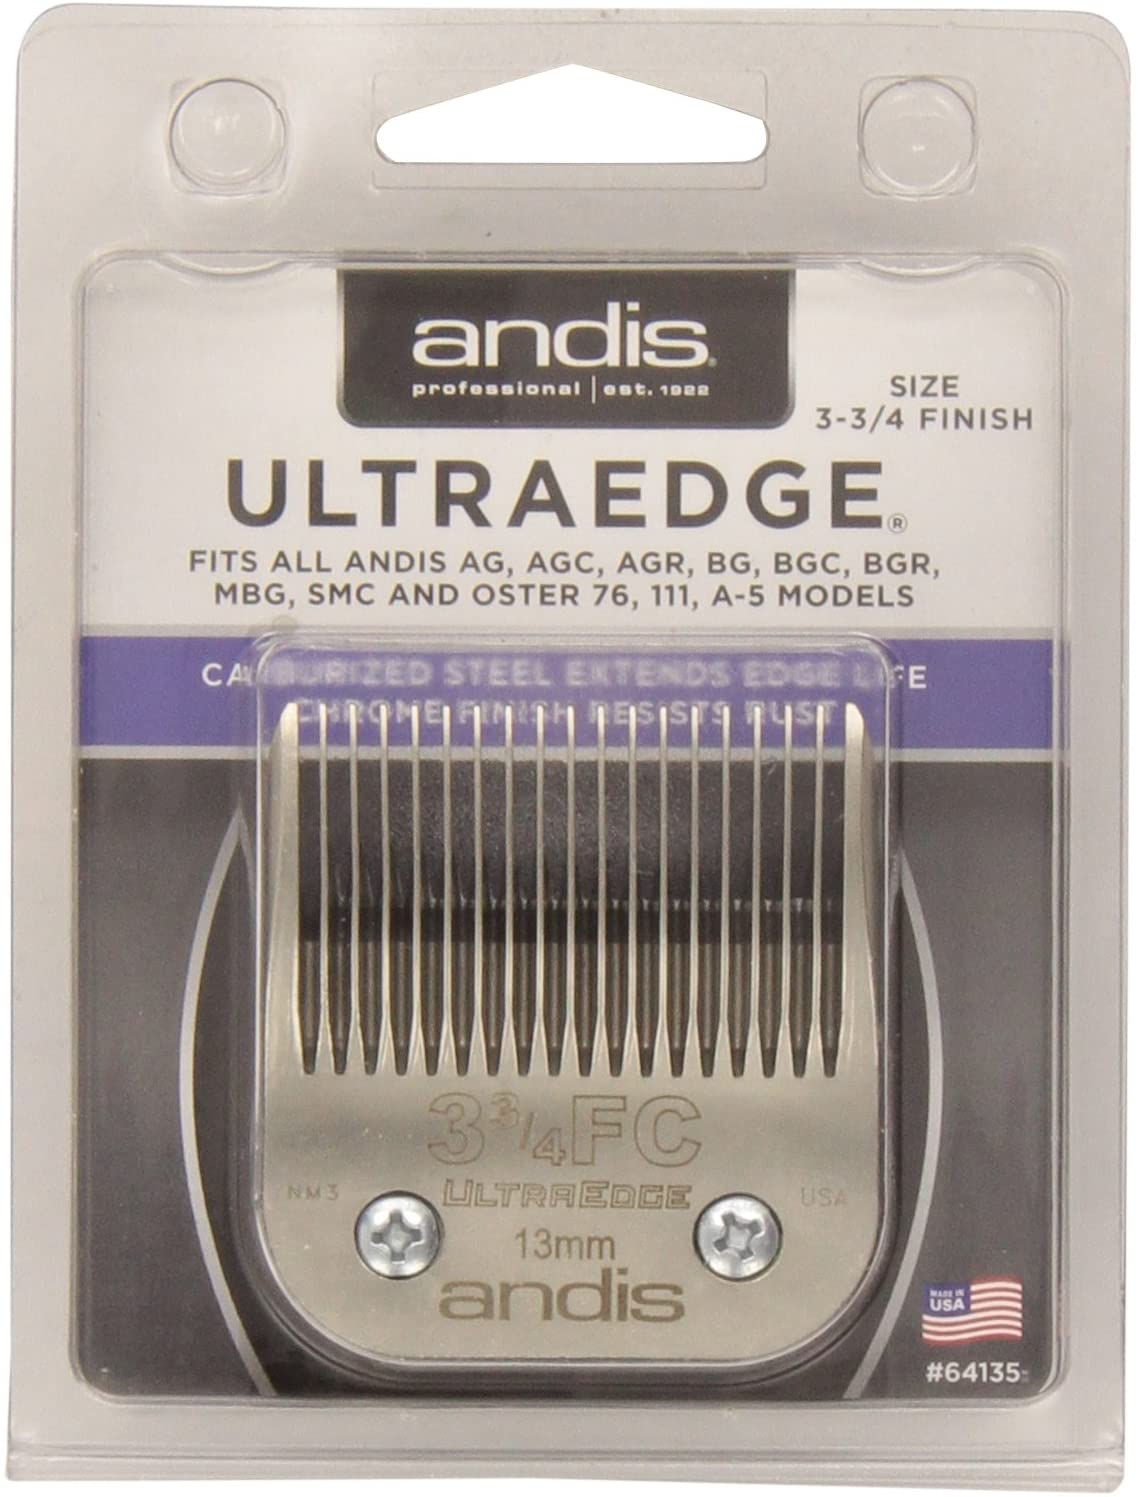 Andis UltraEdge 9,5 mm Schneidkopf 2